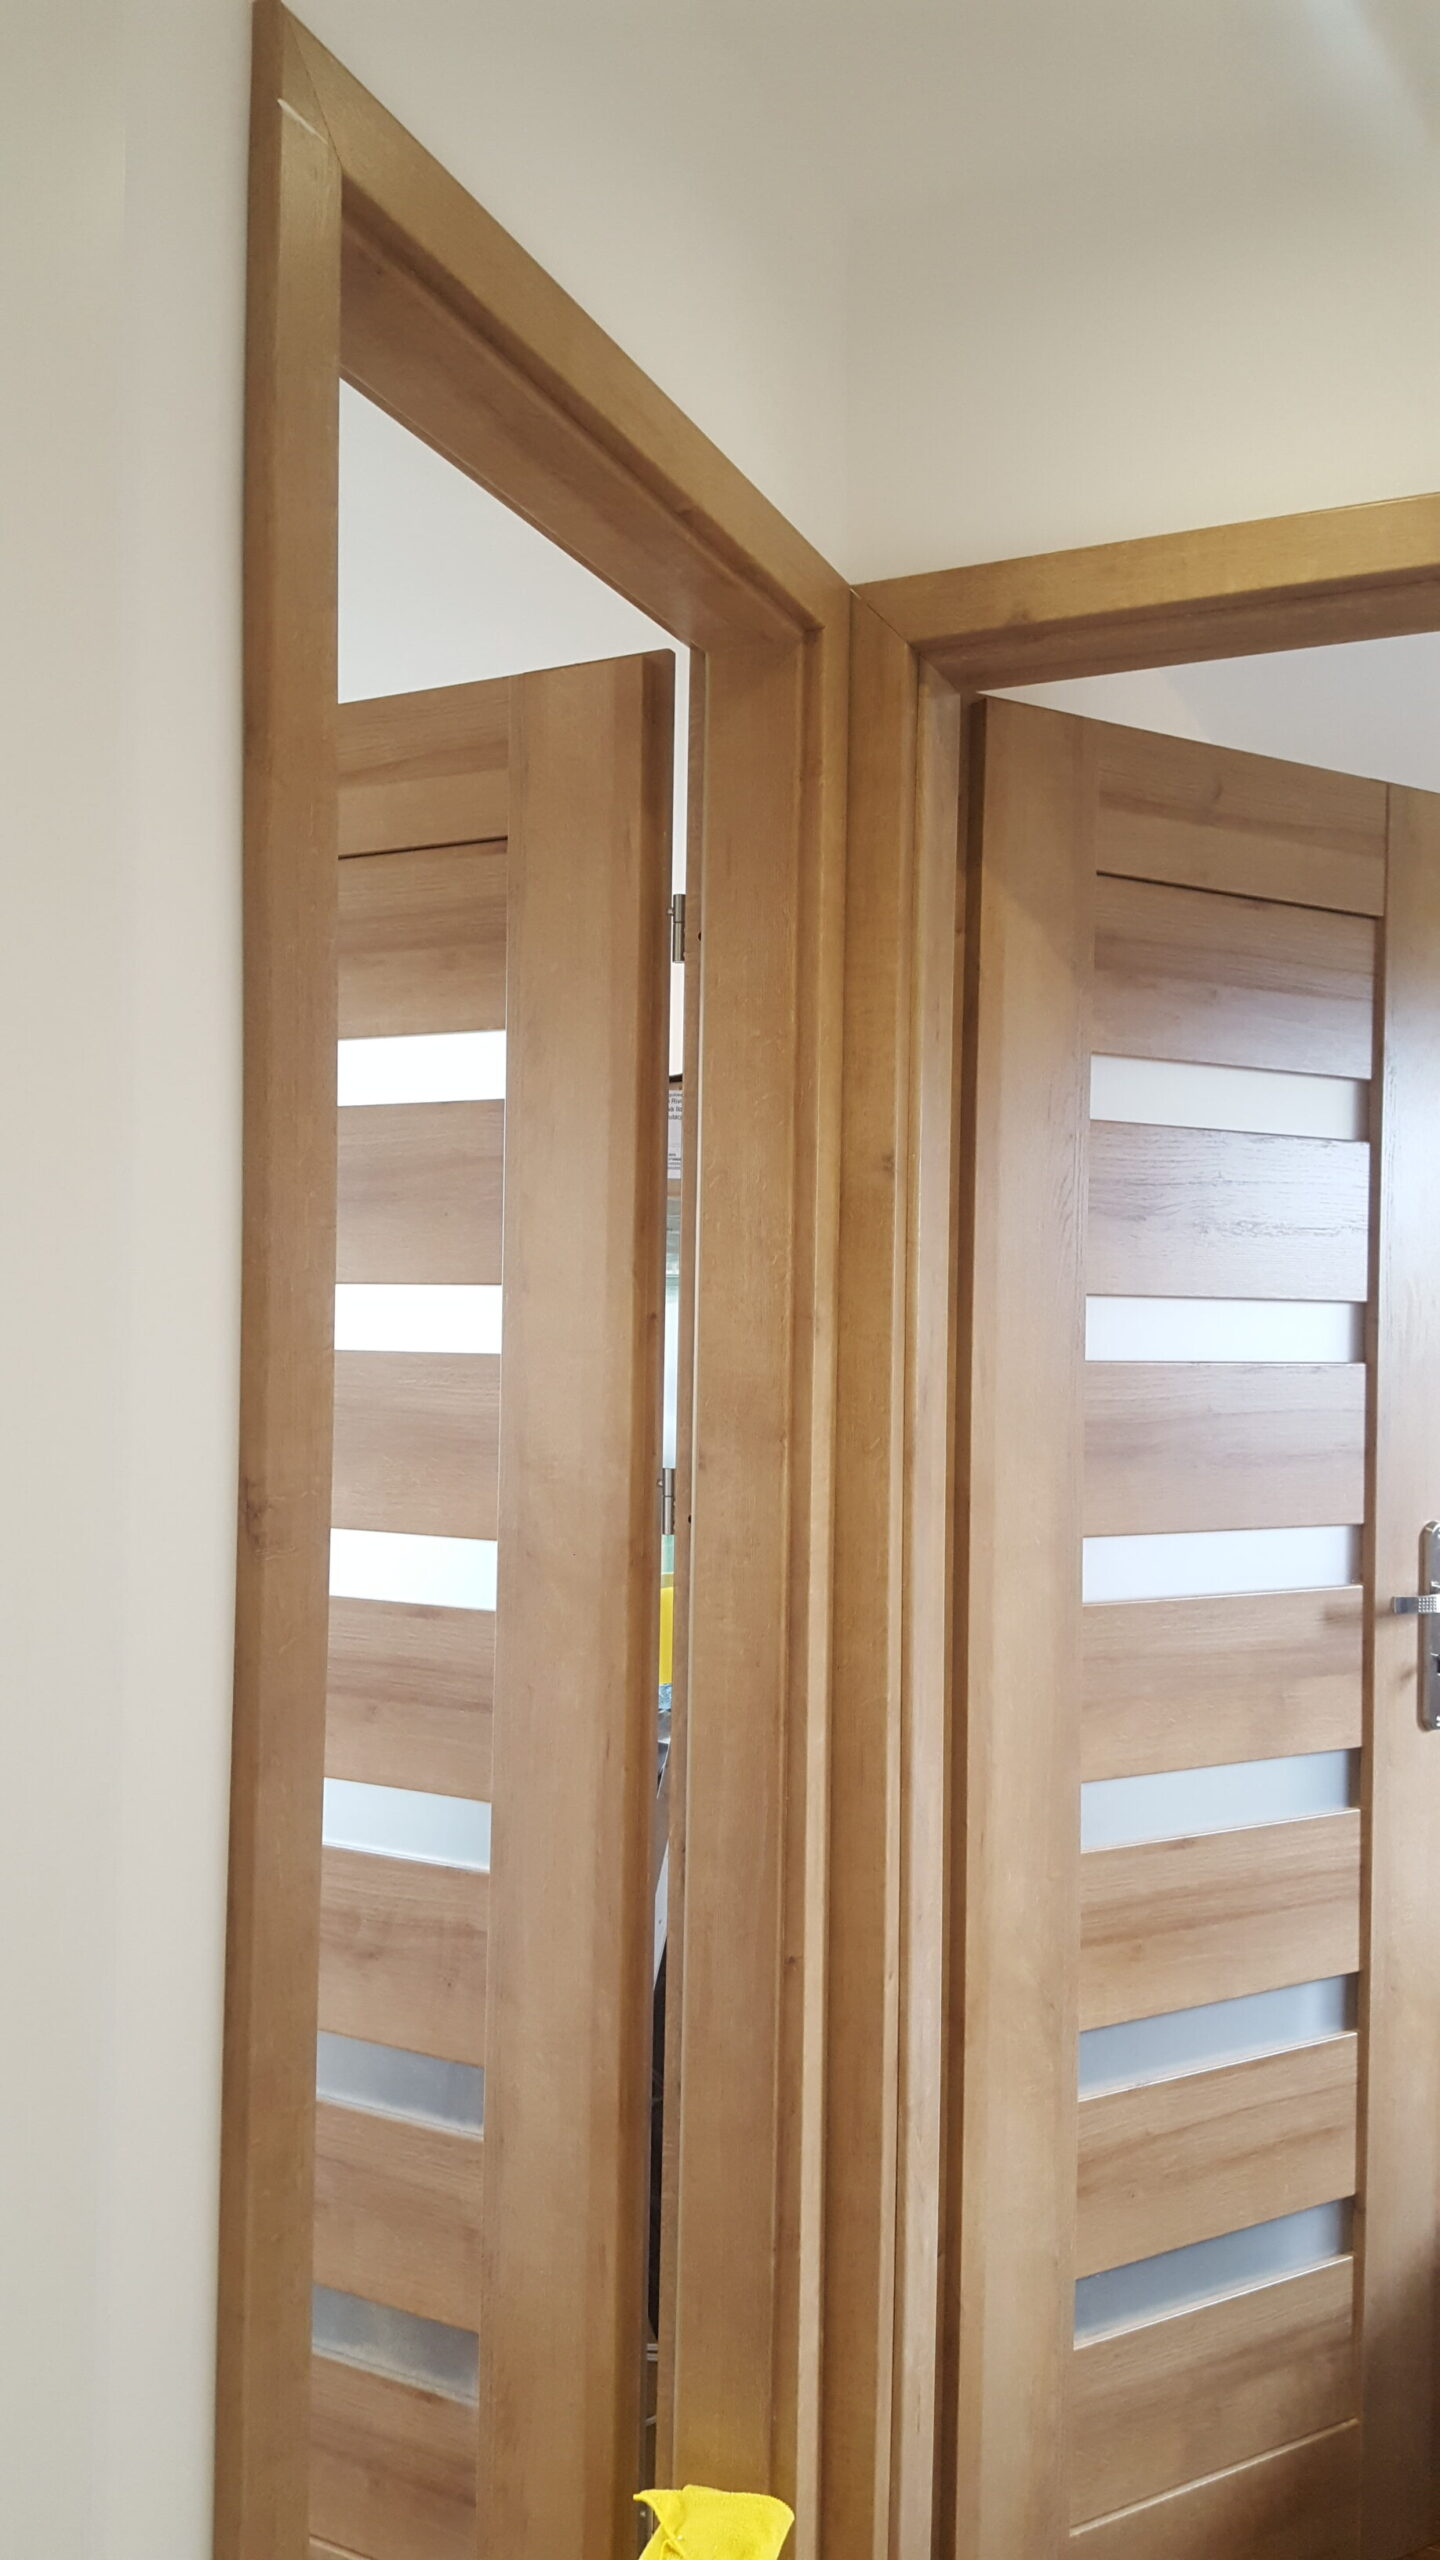 Richmond door fitting